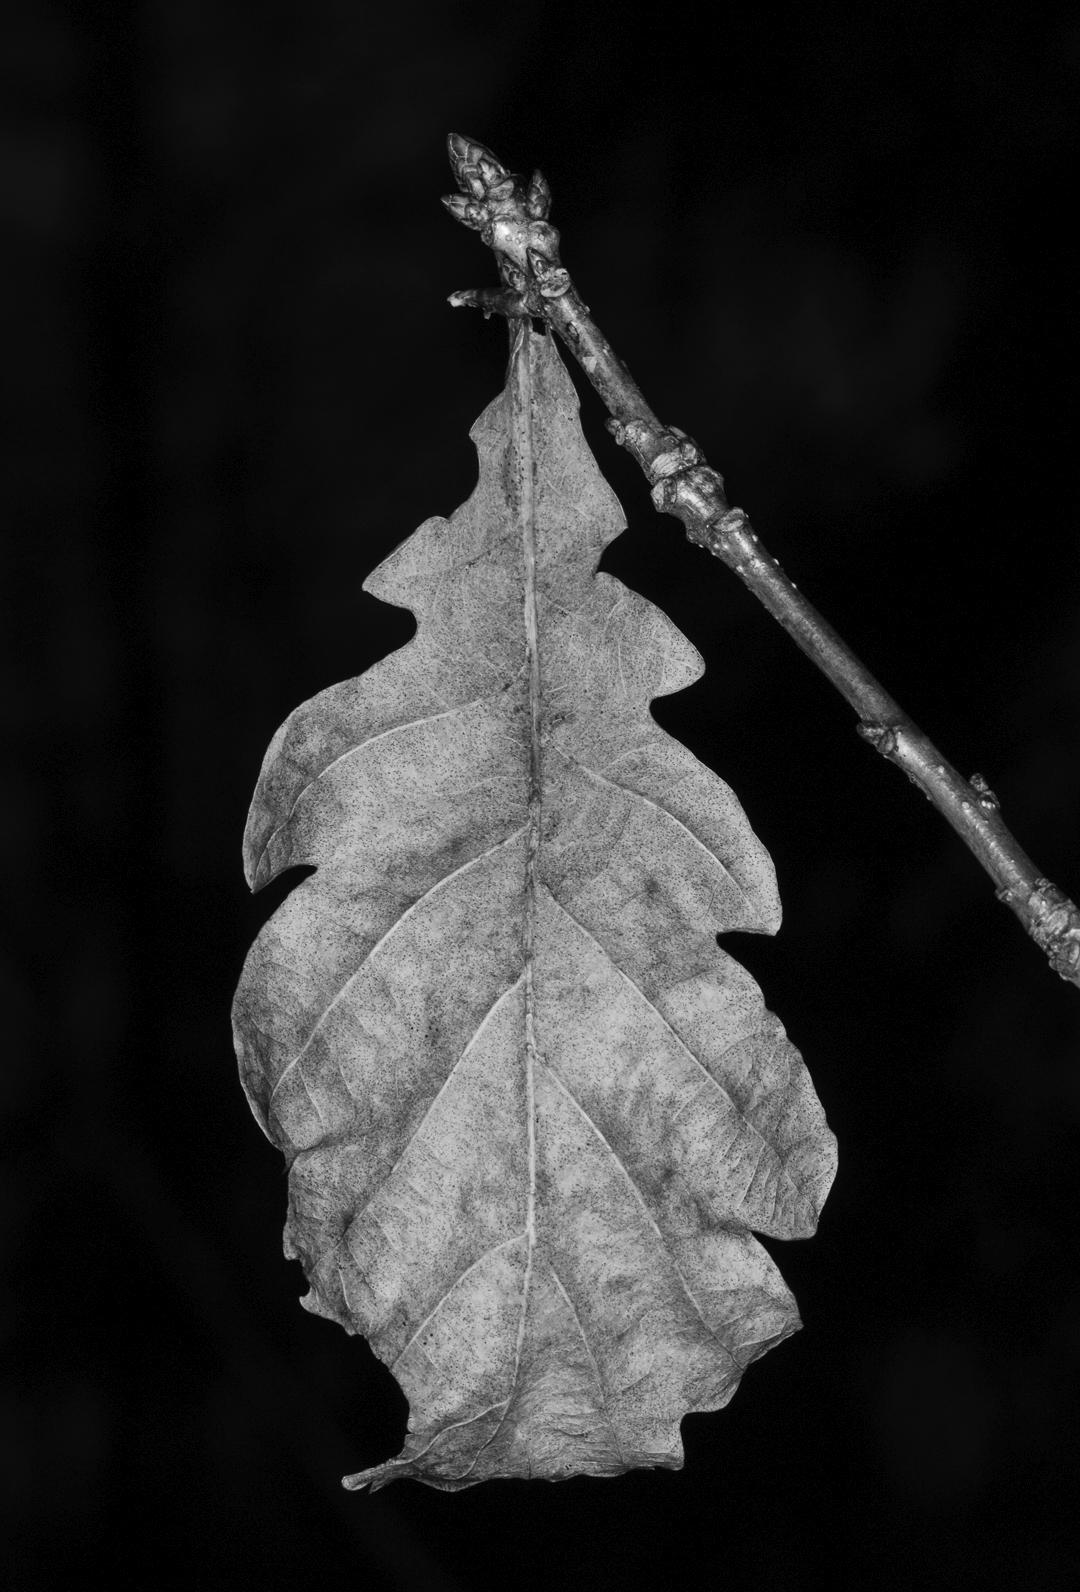 Oak leaf - photography, macro, canon - anttitassberg | ello